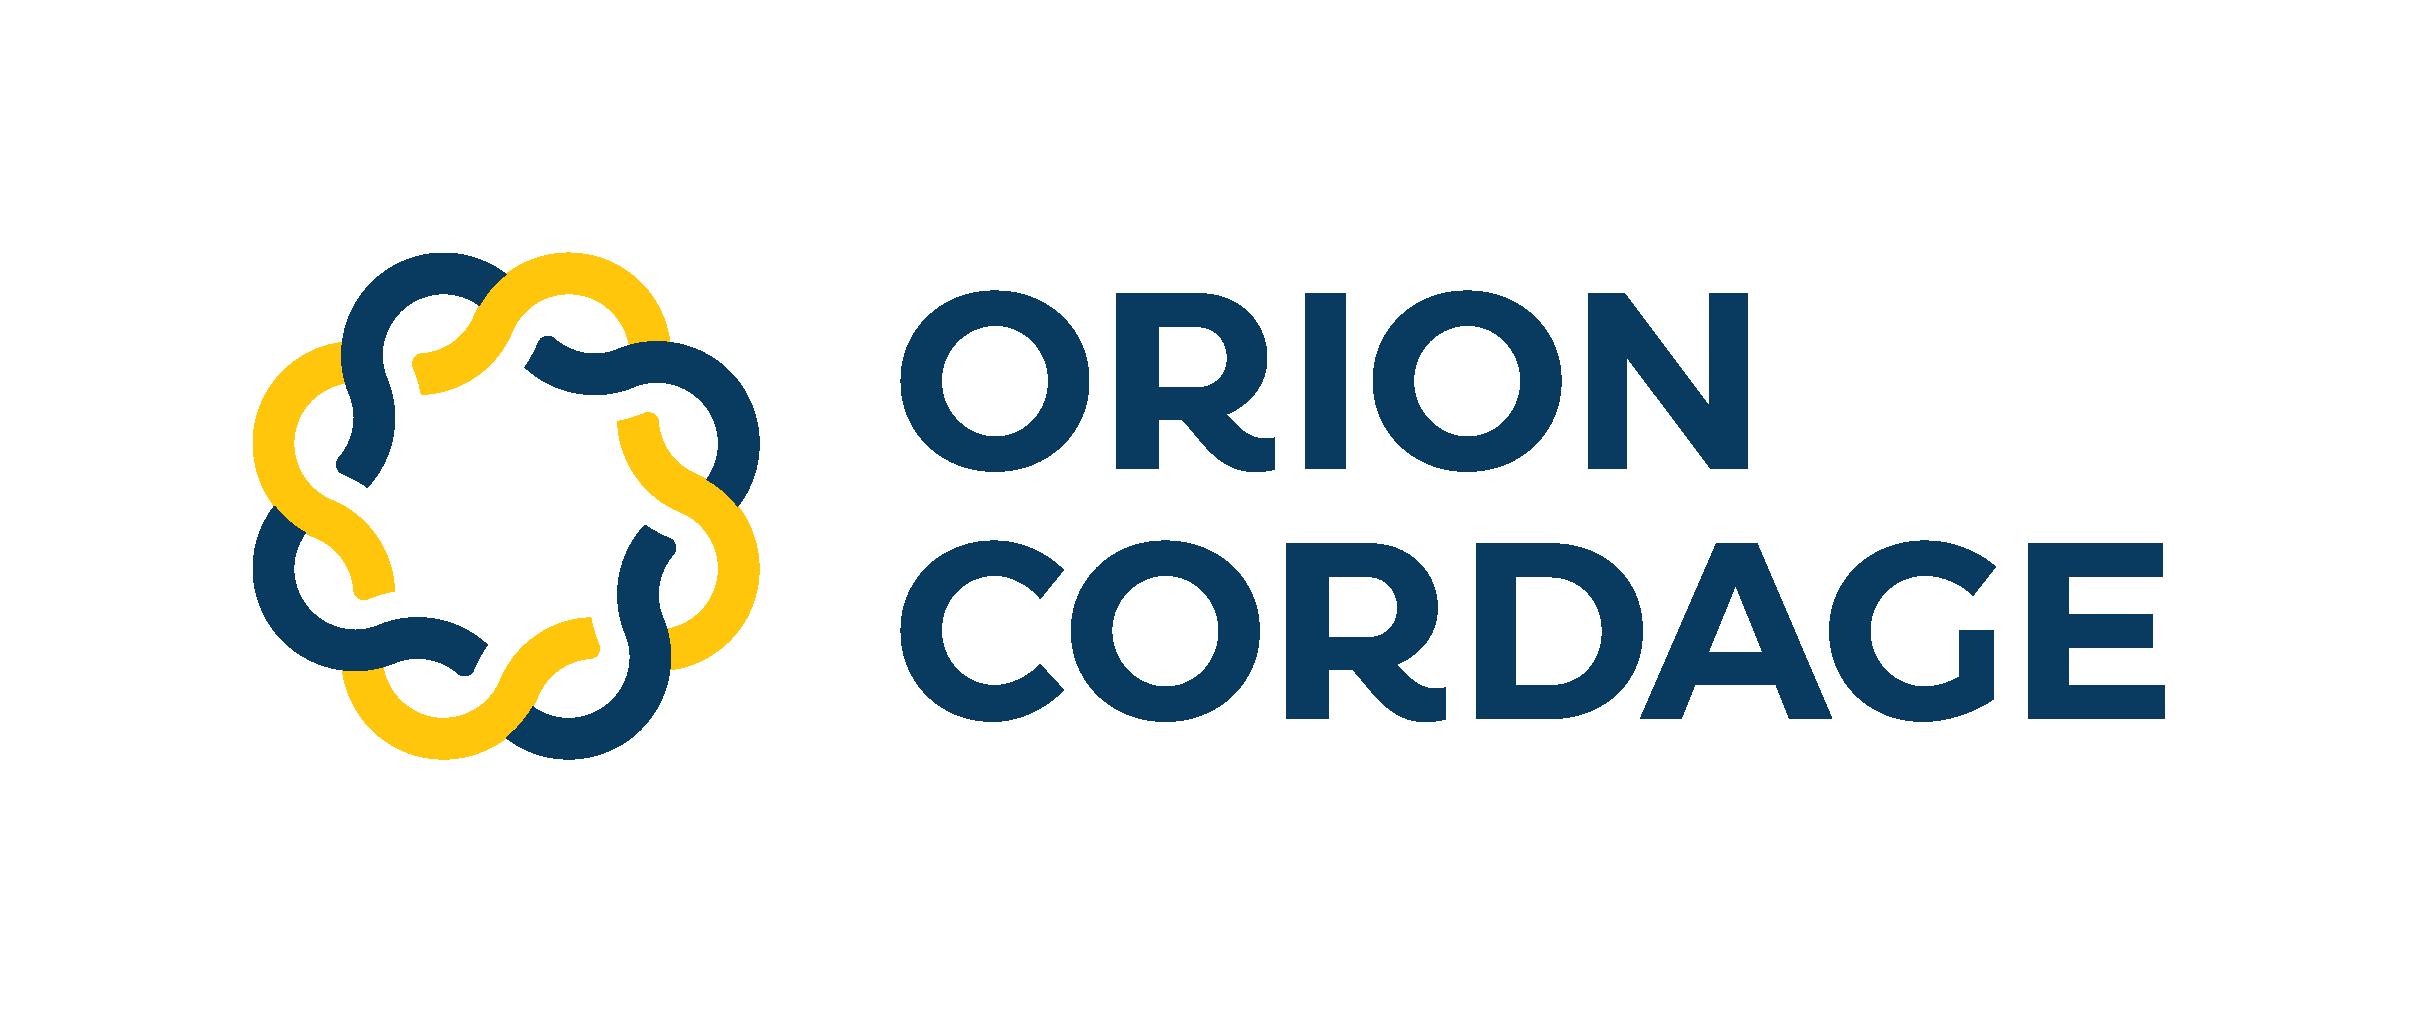 Orion Cordage